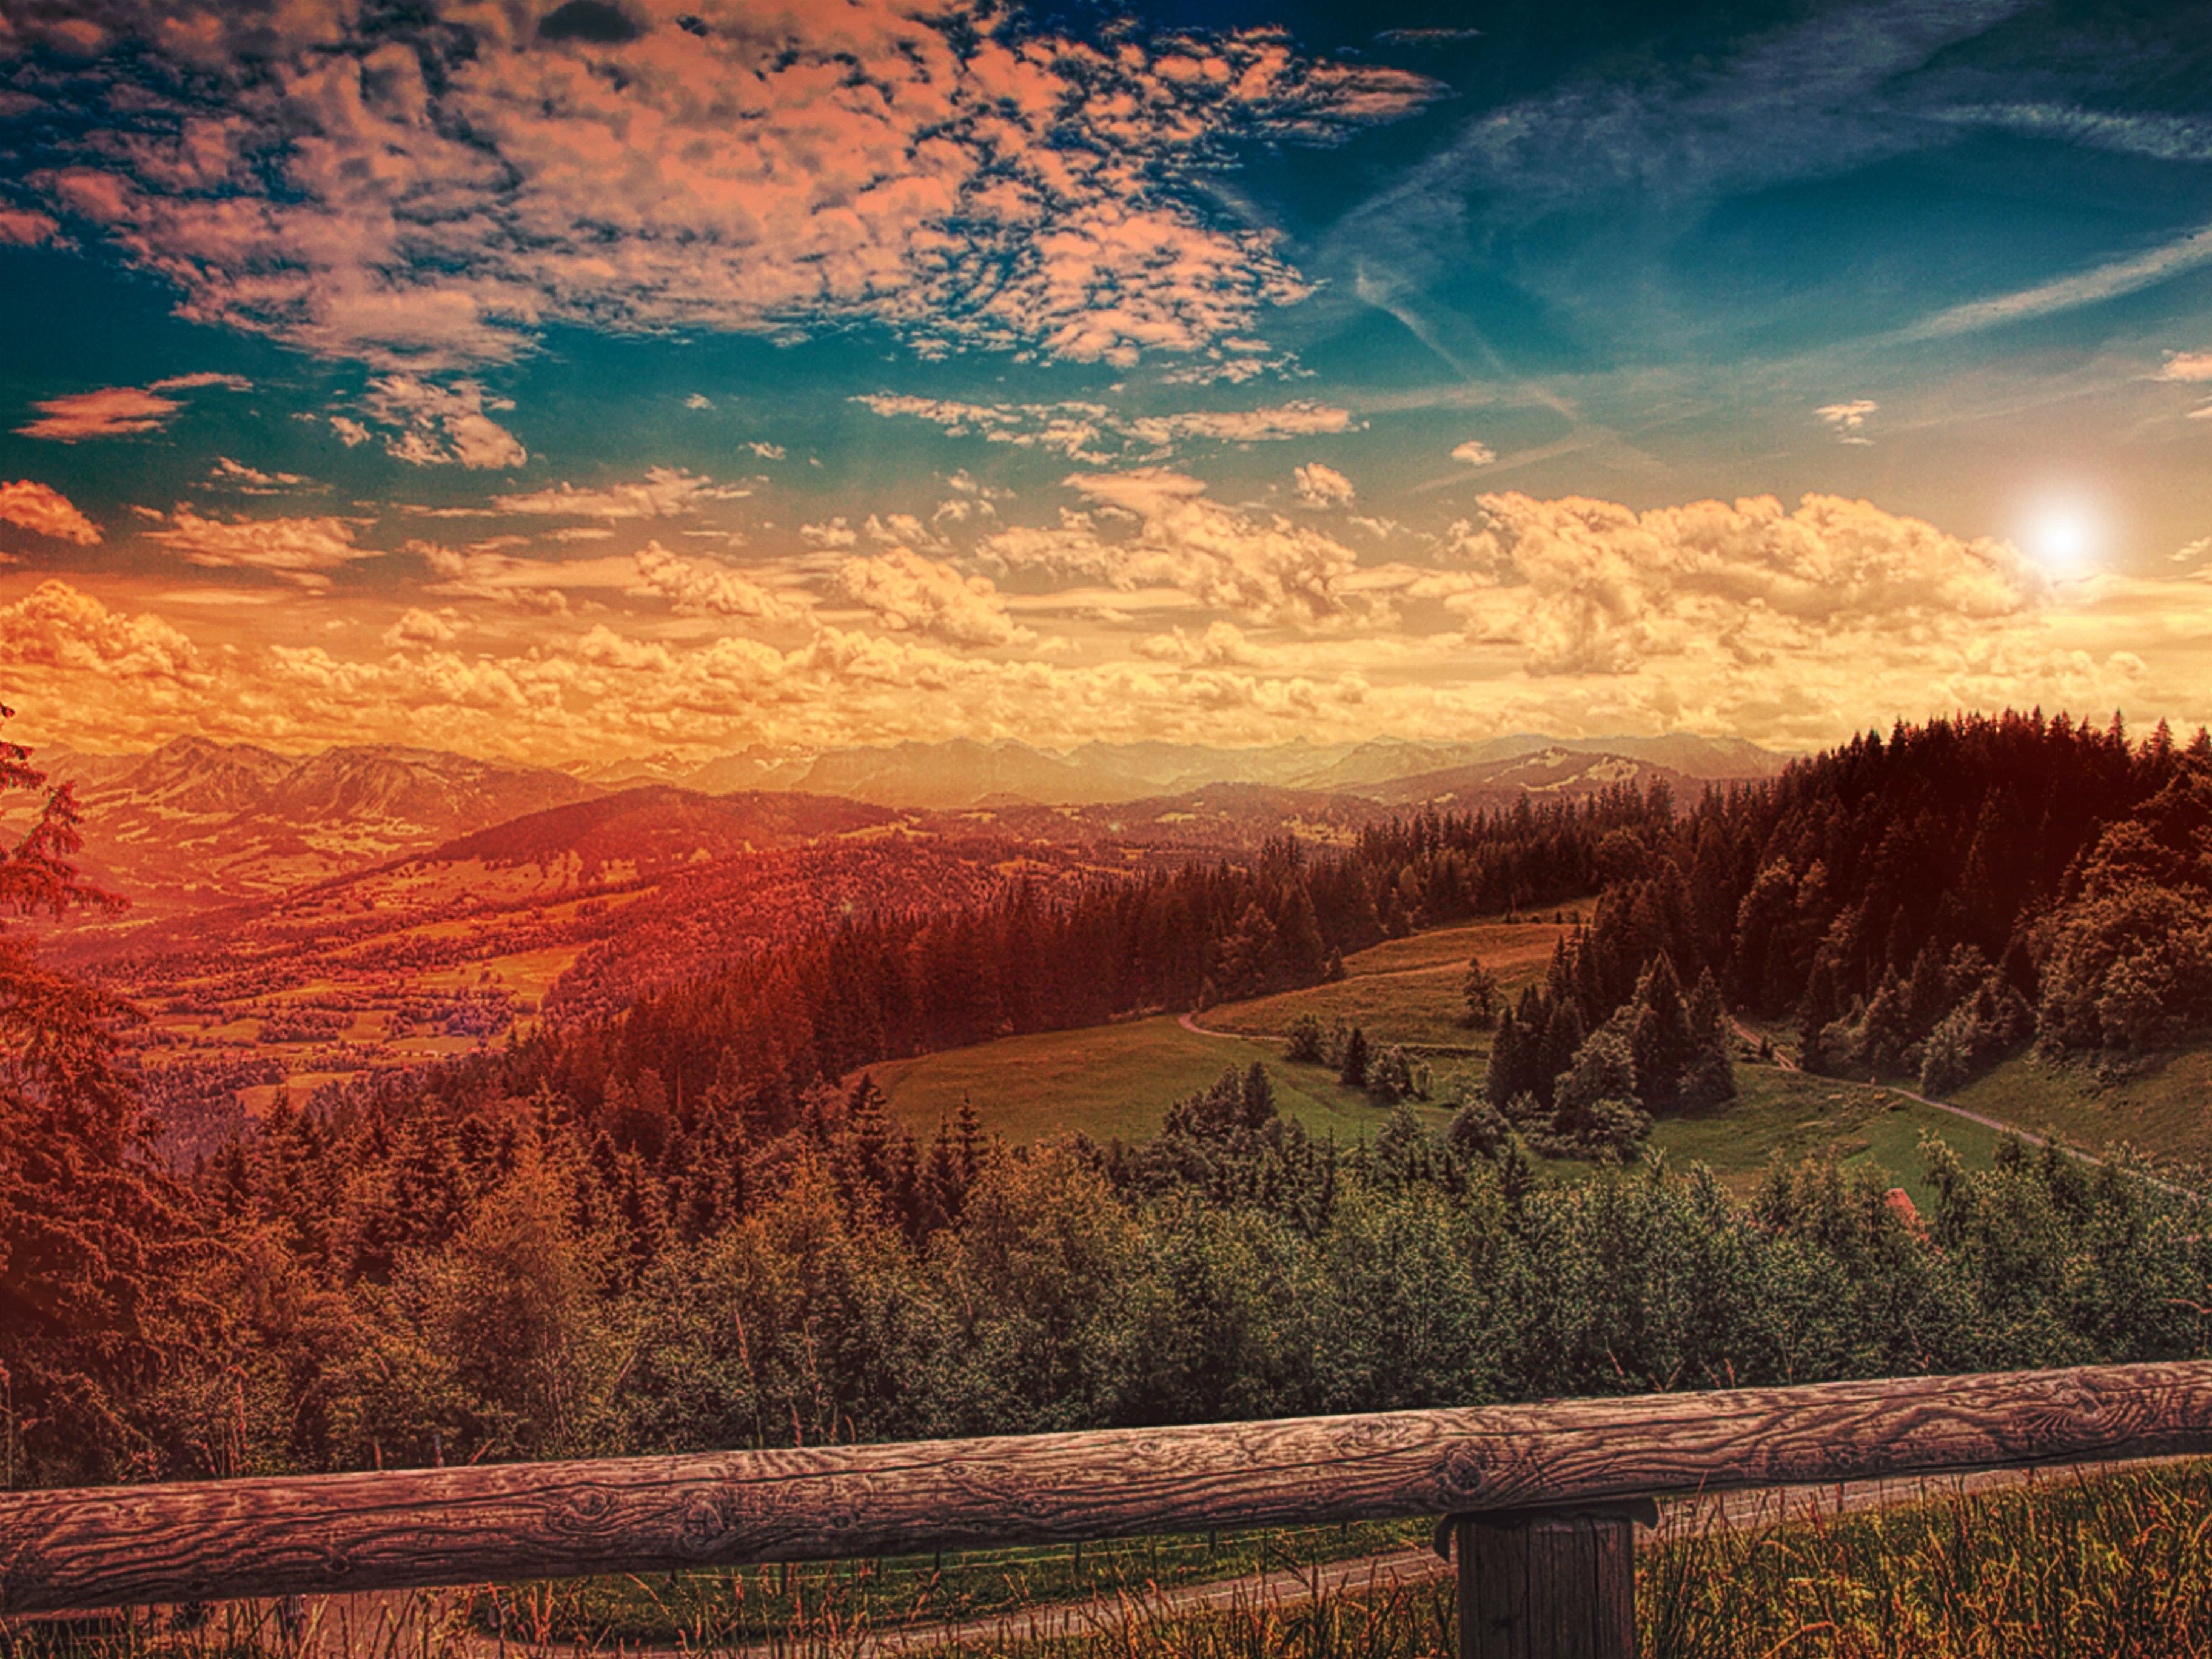 nature wallpapers pexels free stock photos